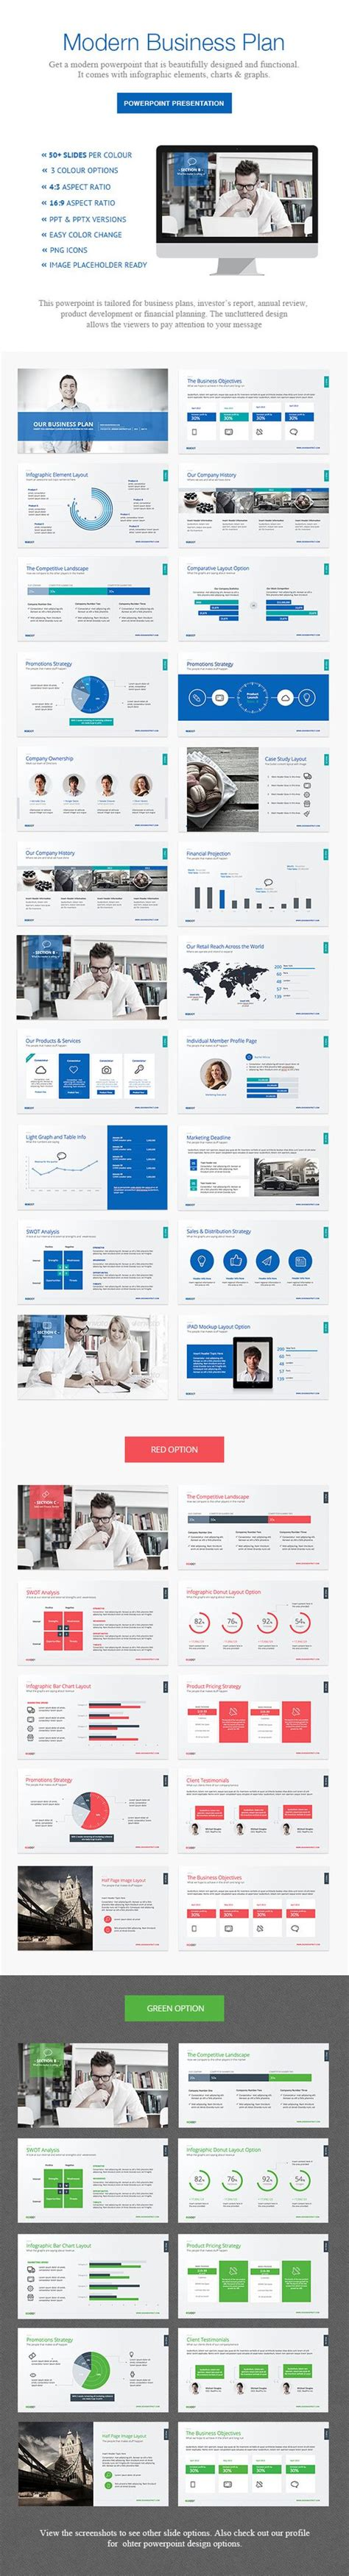 powerpoint templates microsoft 2010 powerpoint 2010 design templates